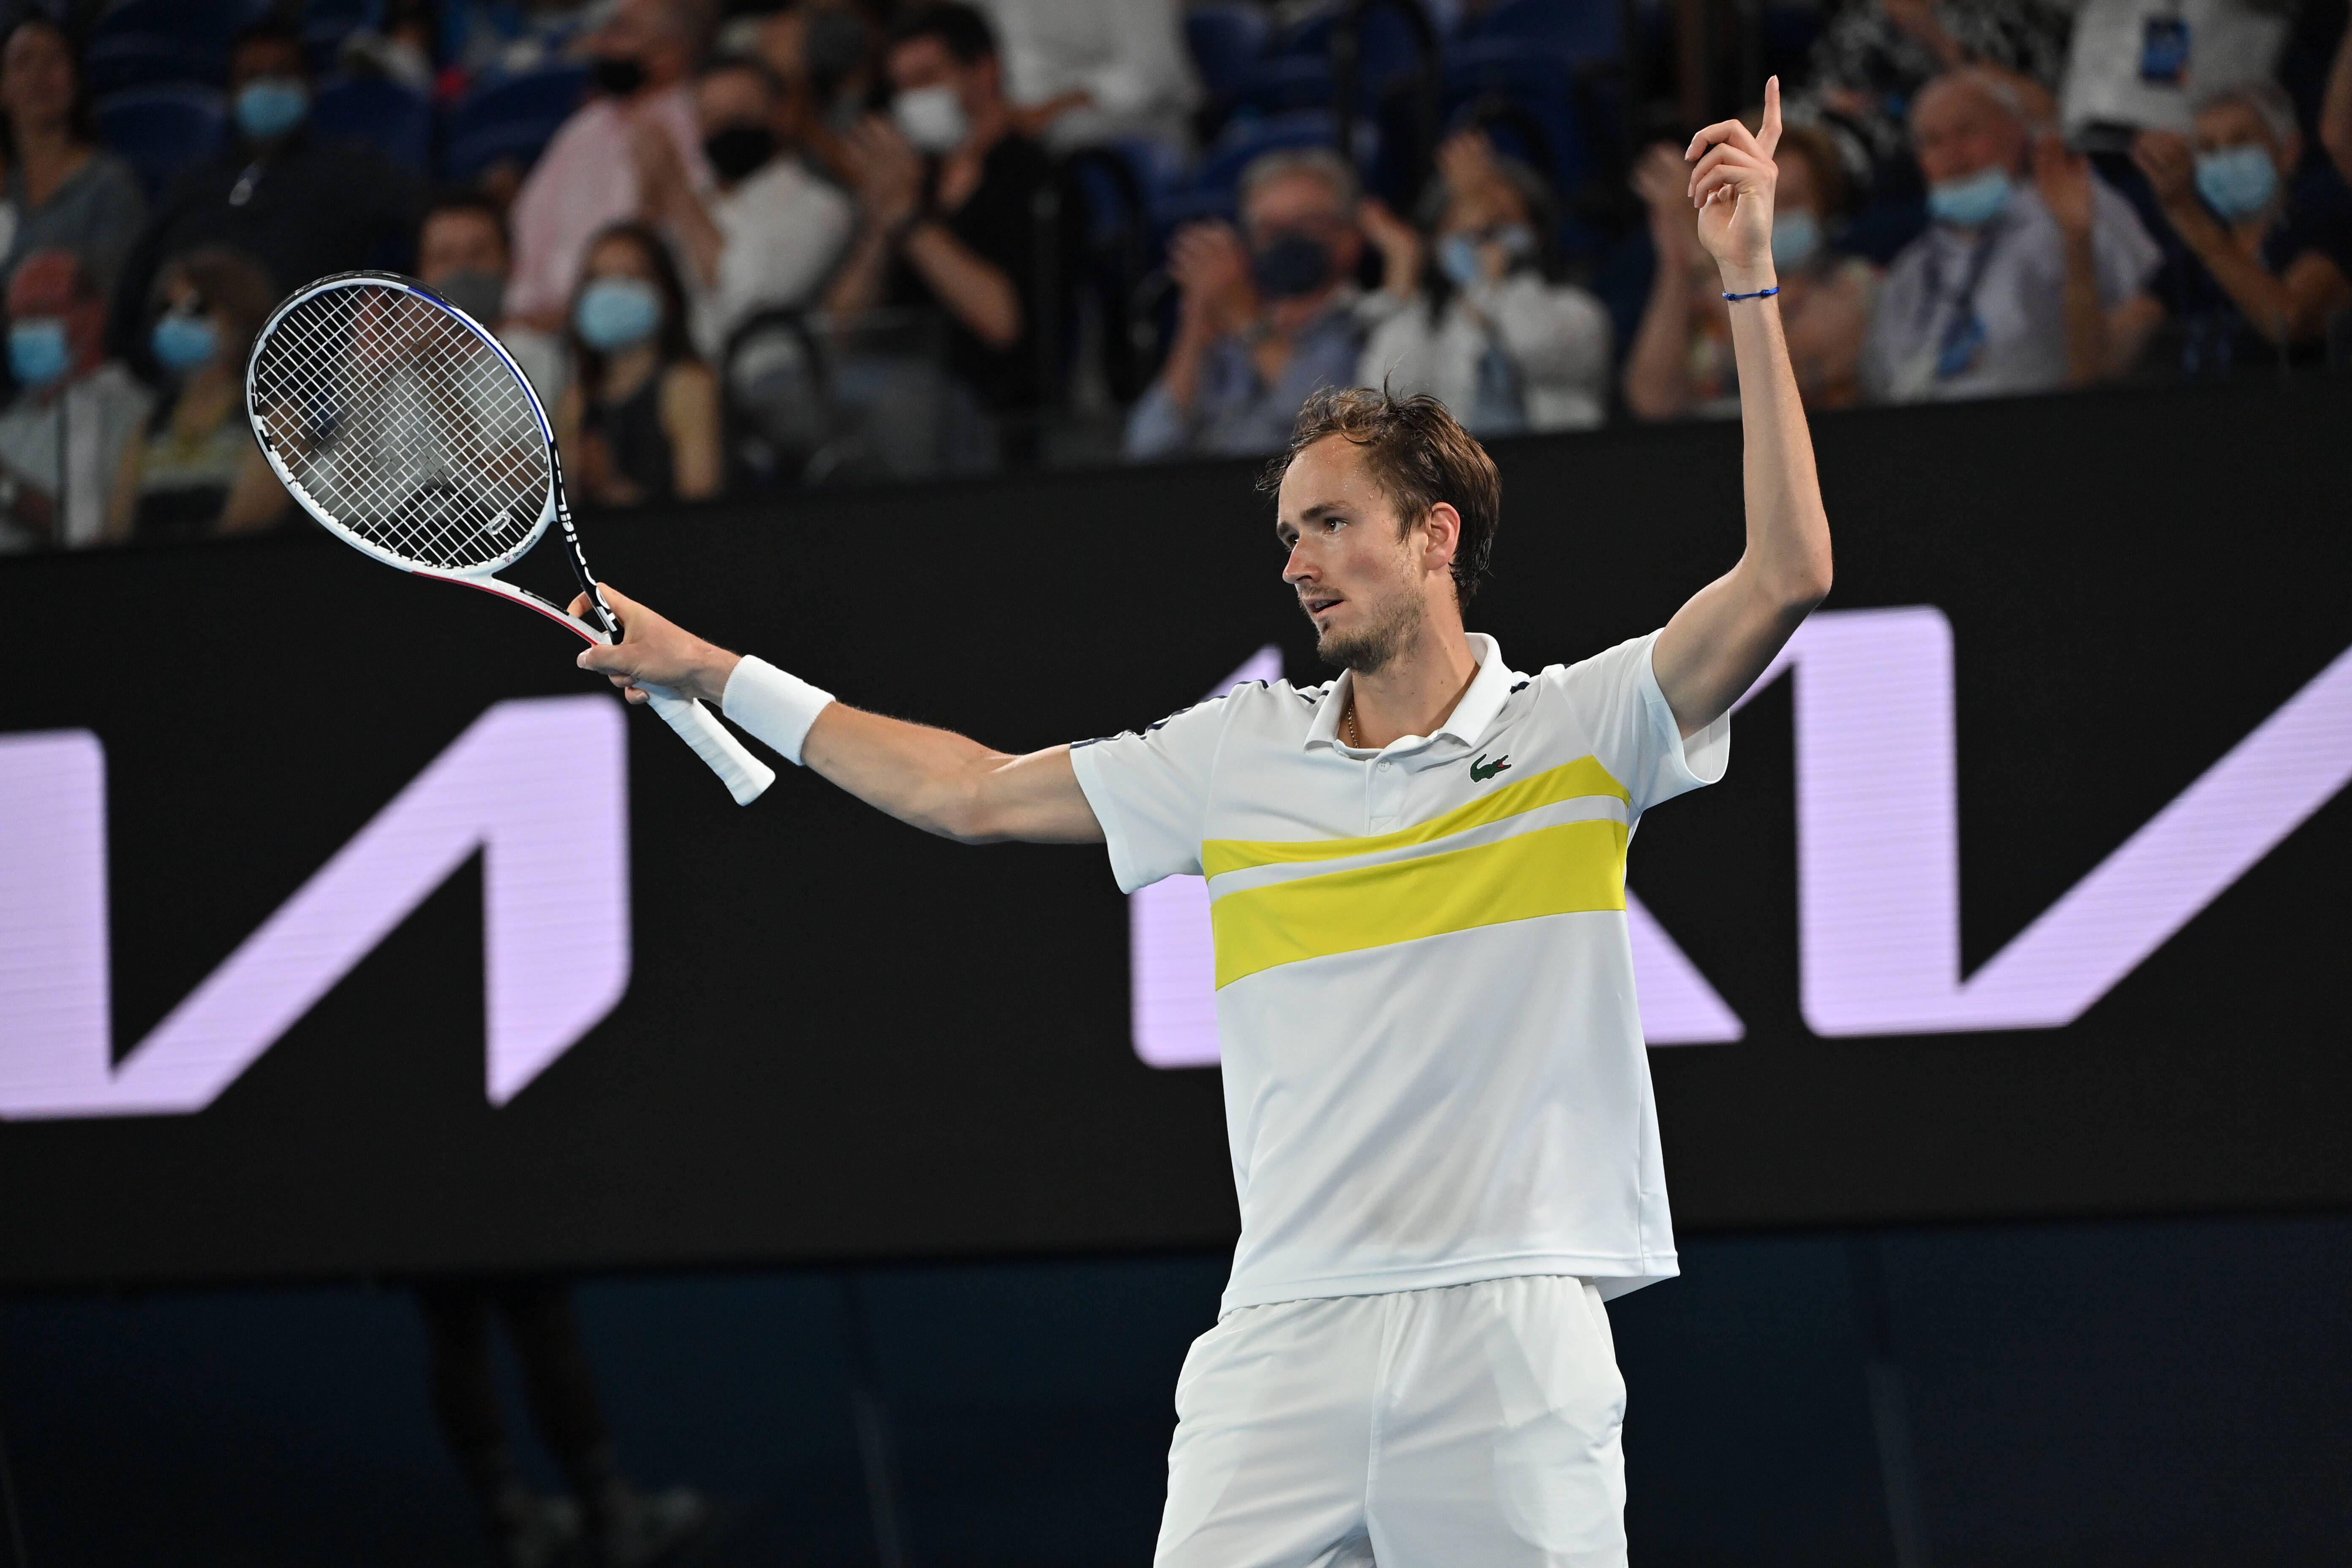 Теннис, Australian Open, финал, Медведев - Джокович, прямая текстовая онлайн трансляция